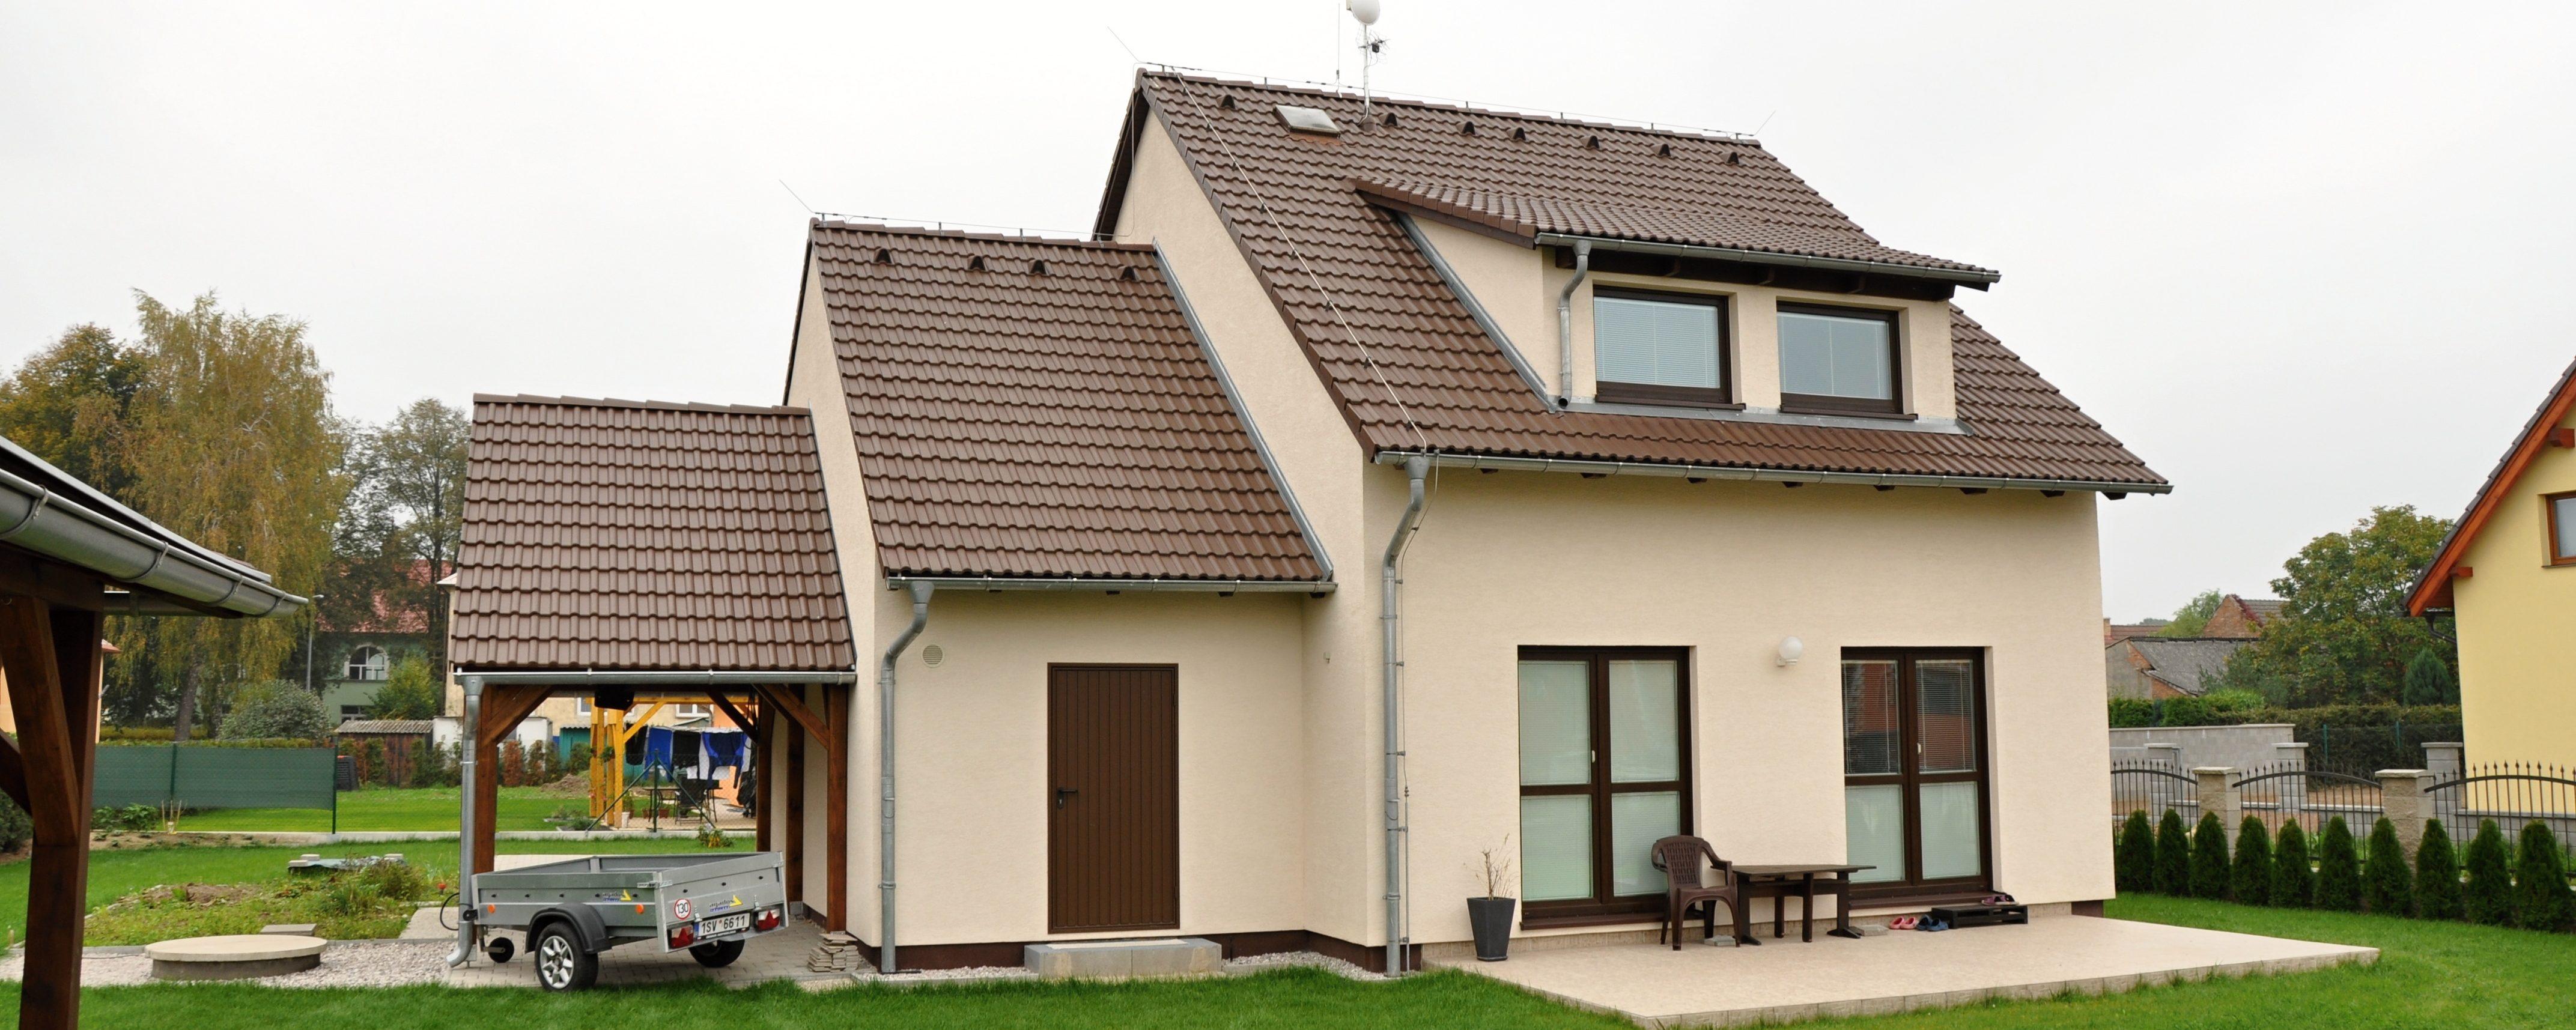 Beautiful goedkoop huis bouwen prefab with goedkoop huis for Goedkope prefab woningen